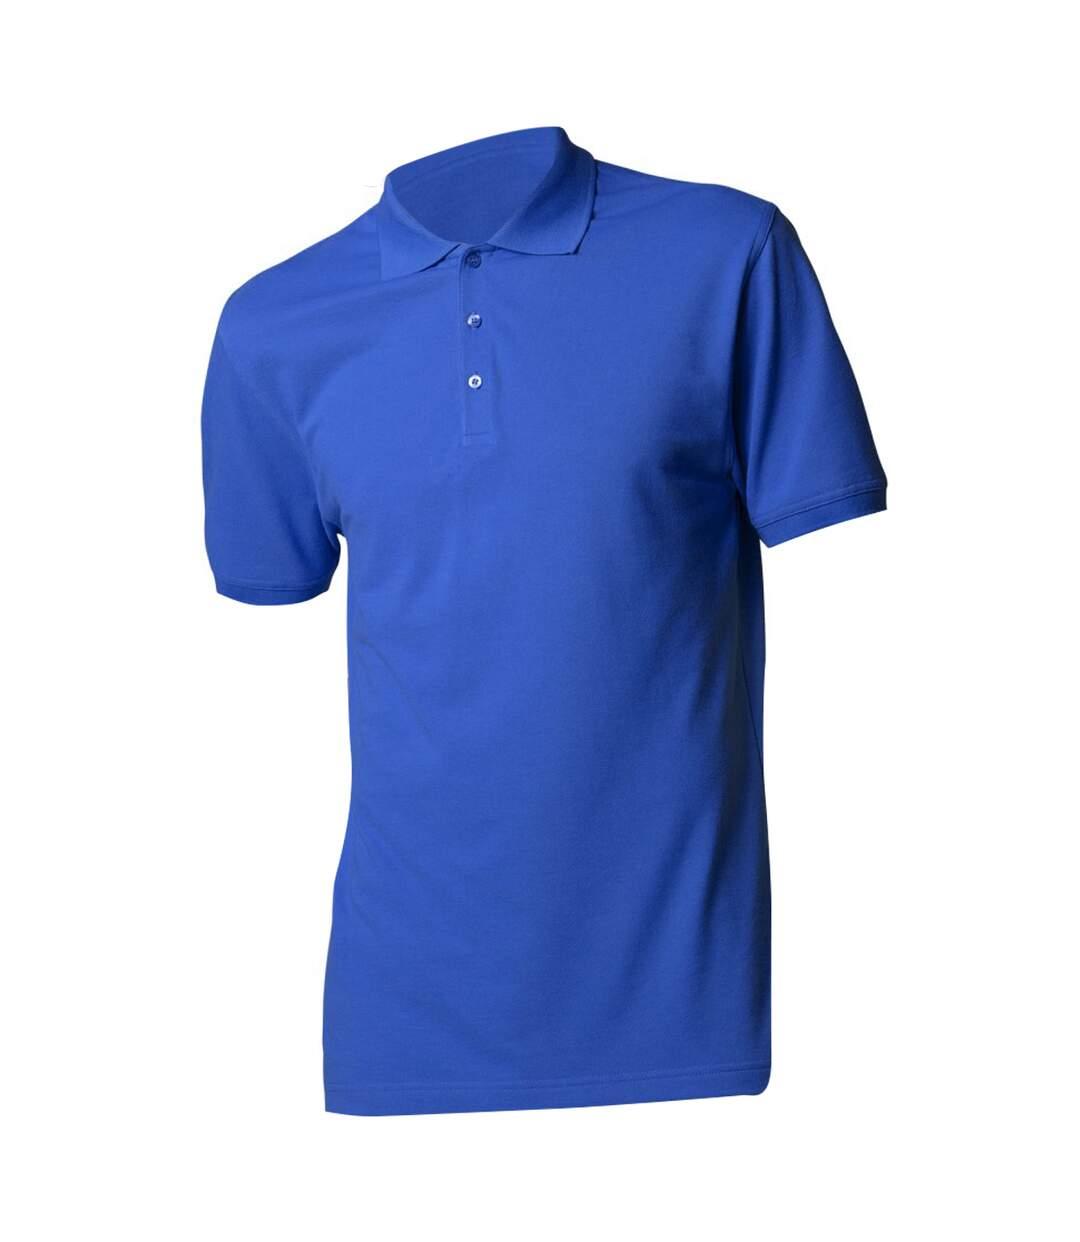 Kustom Kit Mens Short Sleeve Polo Shirt (Turquoise) - UTBC3236